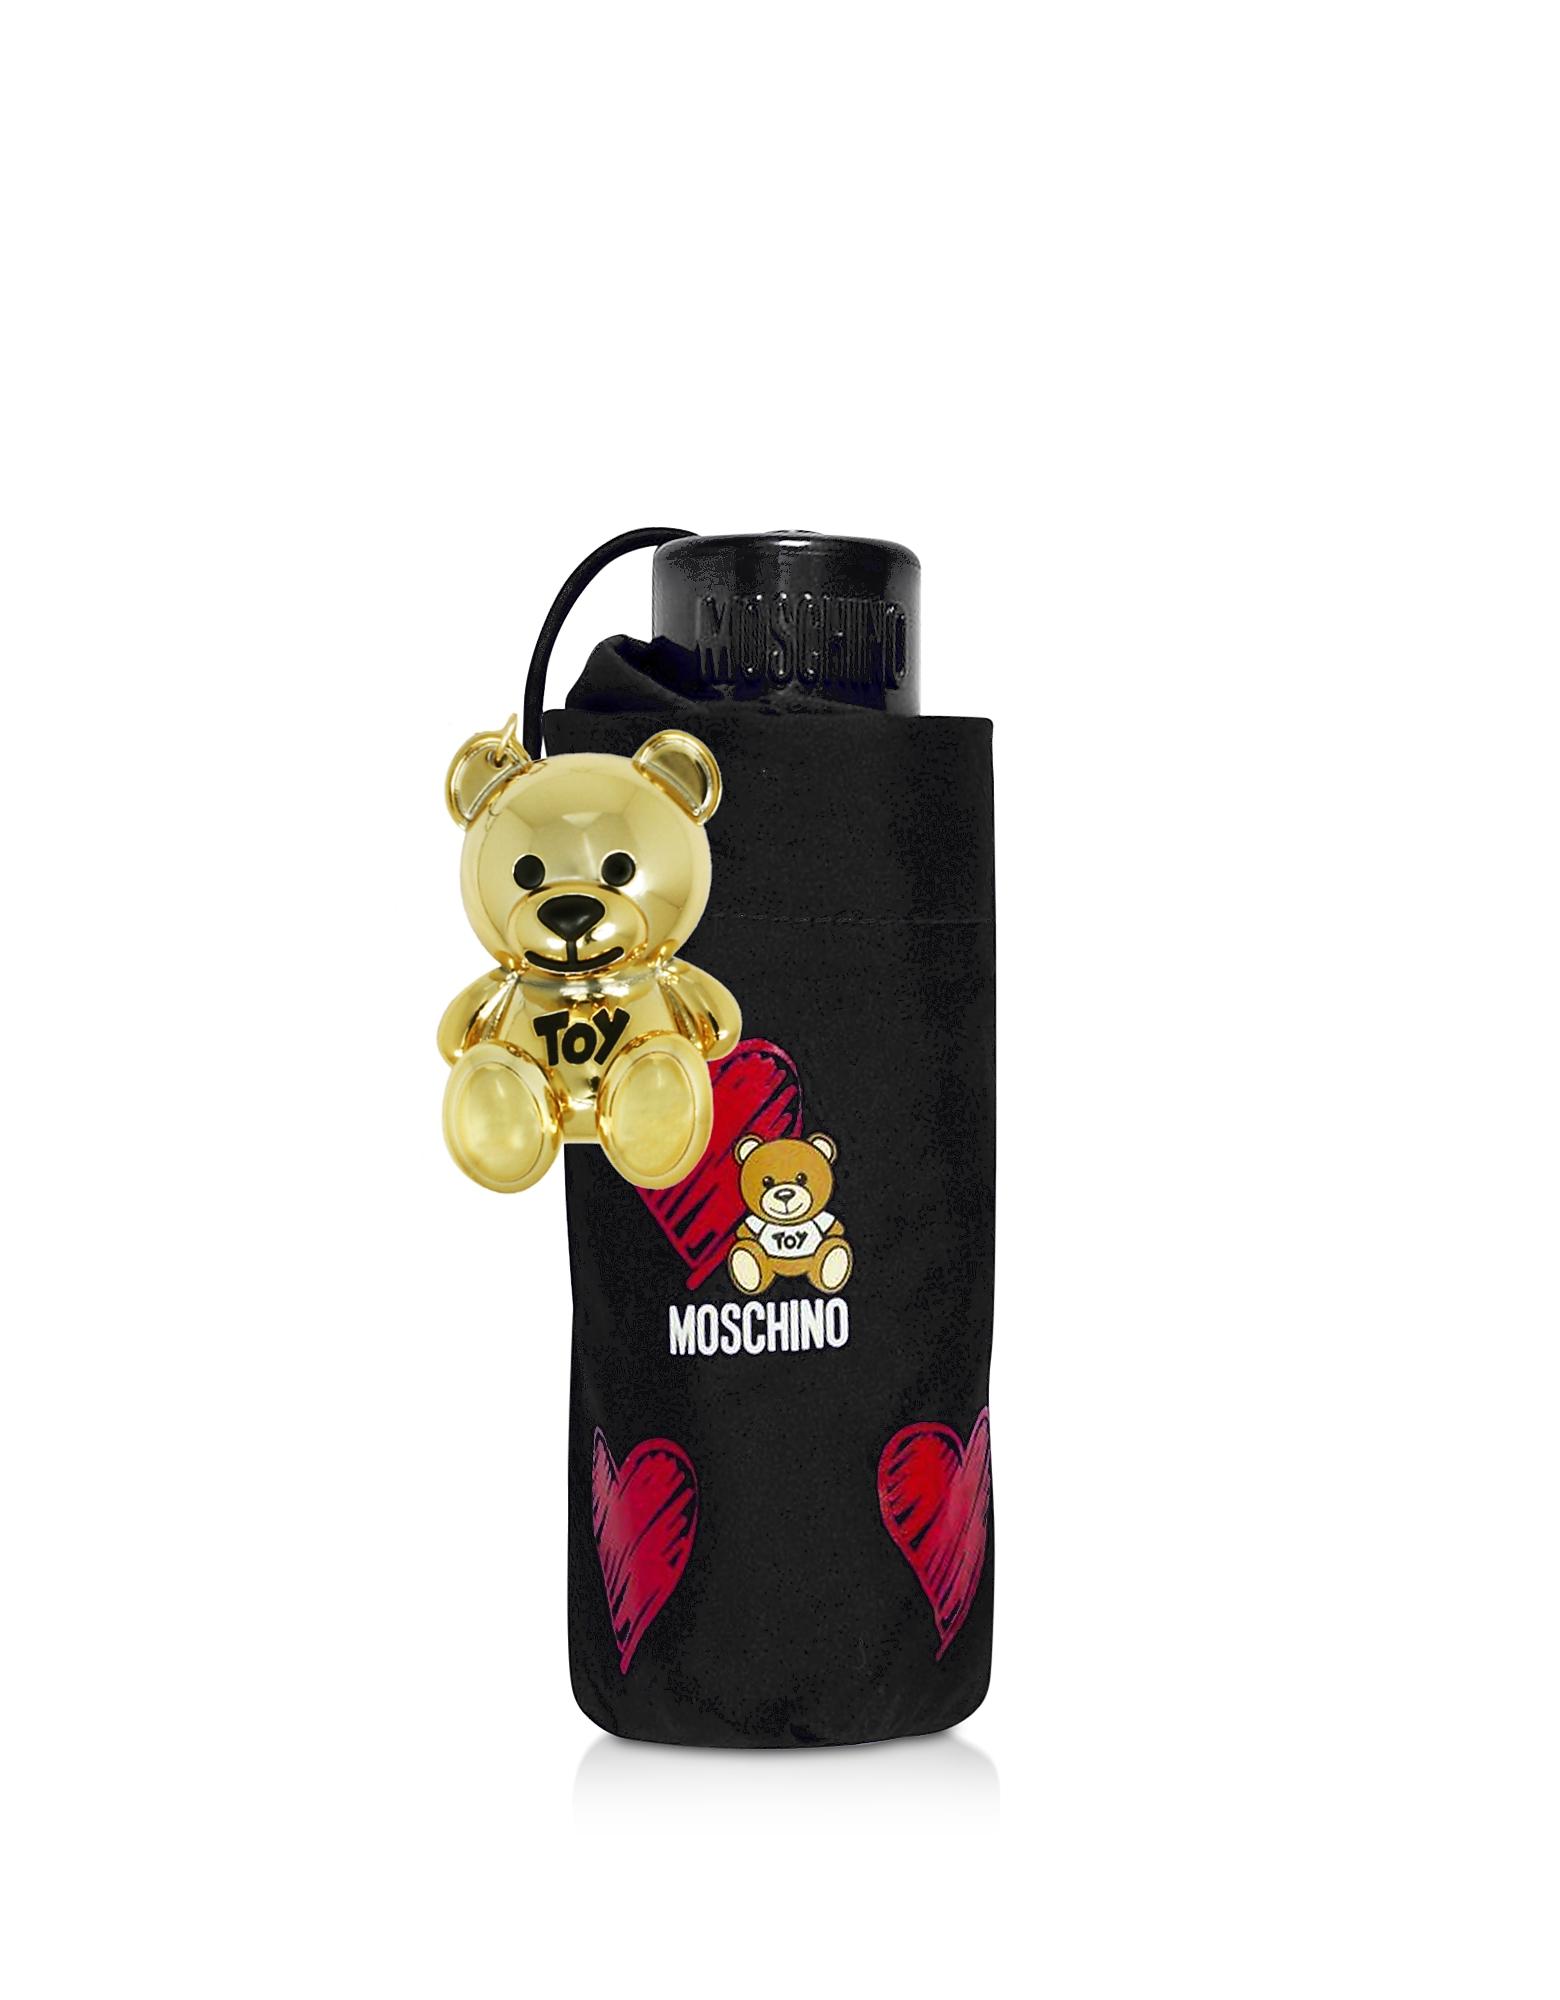 Hearts and Bears Supermini Umbrella, Black